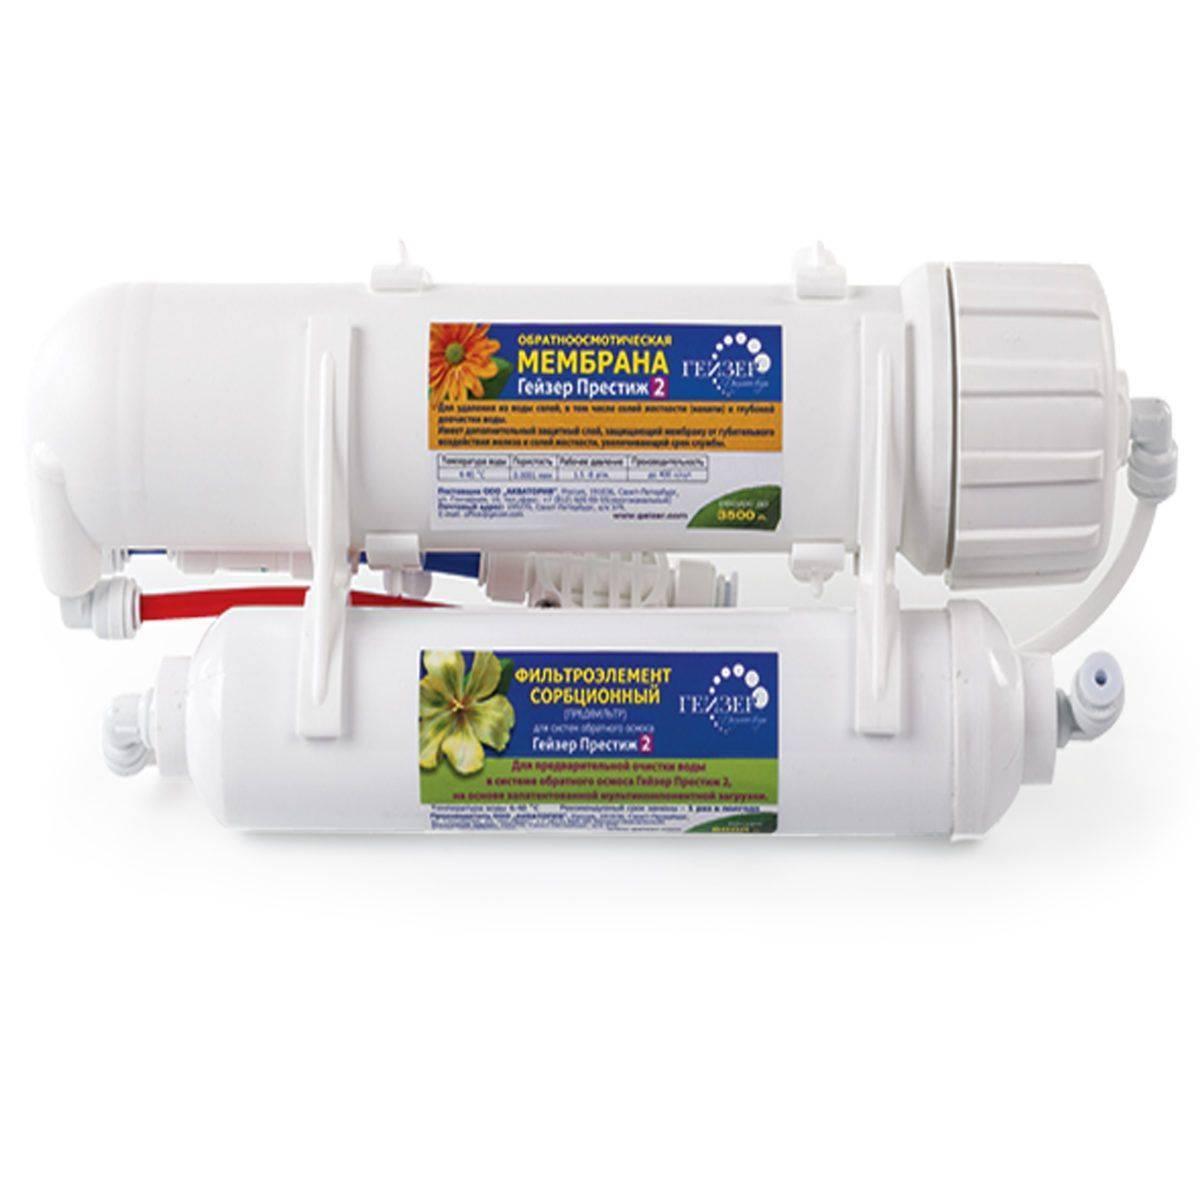 Sistema de osmosis inversa Geyser Prestige-2